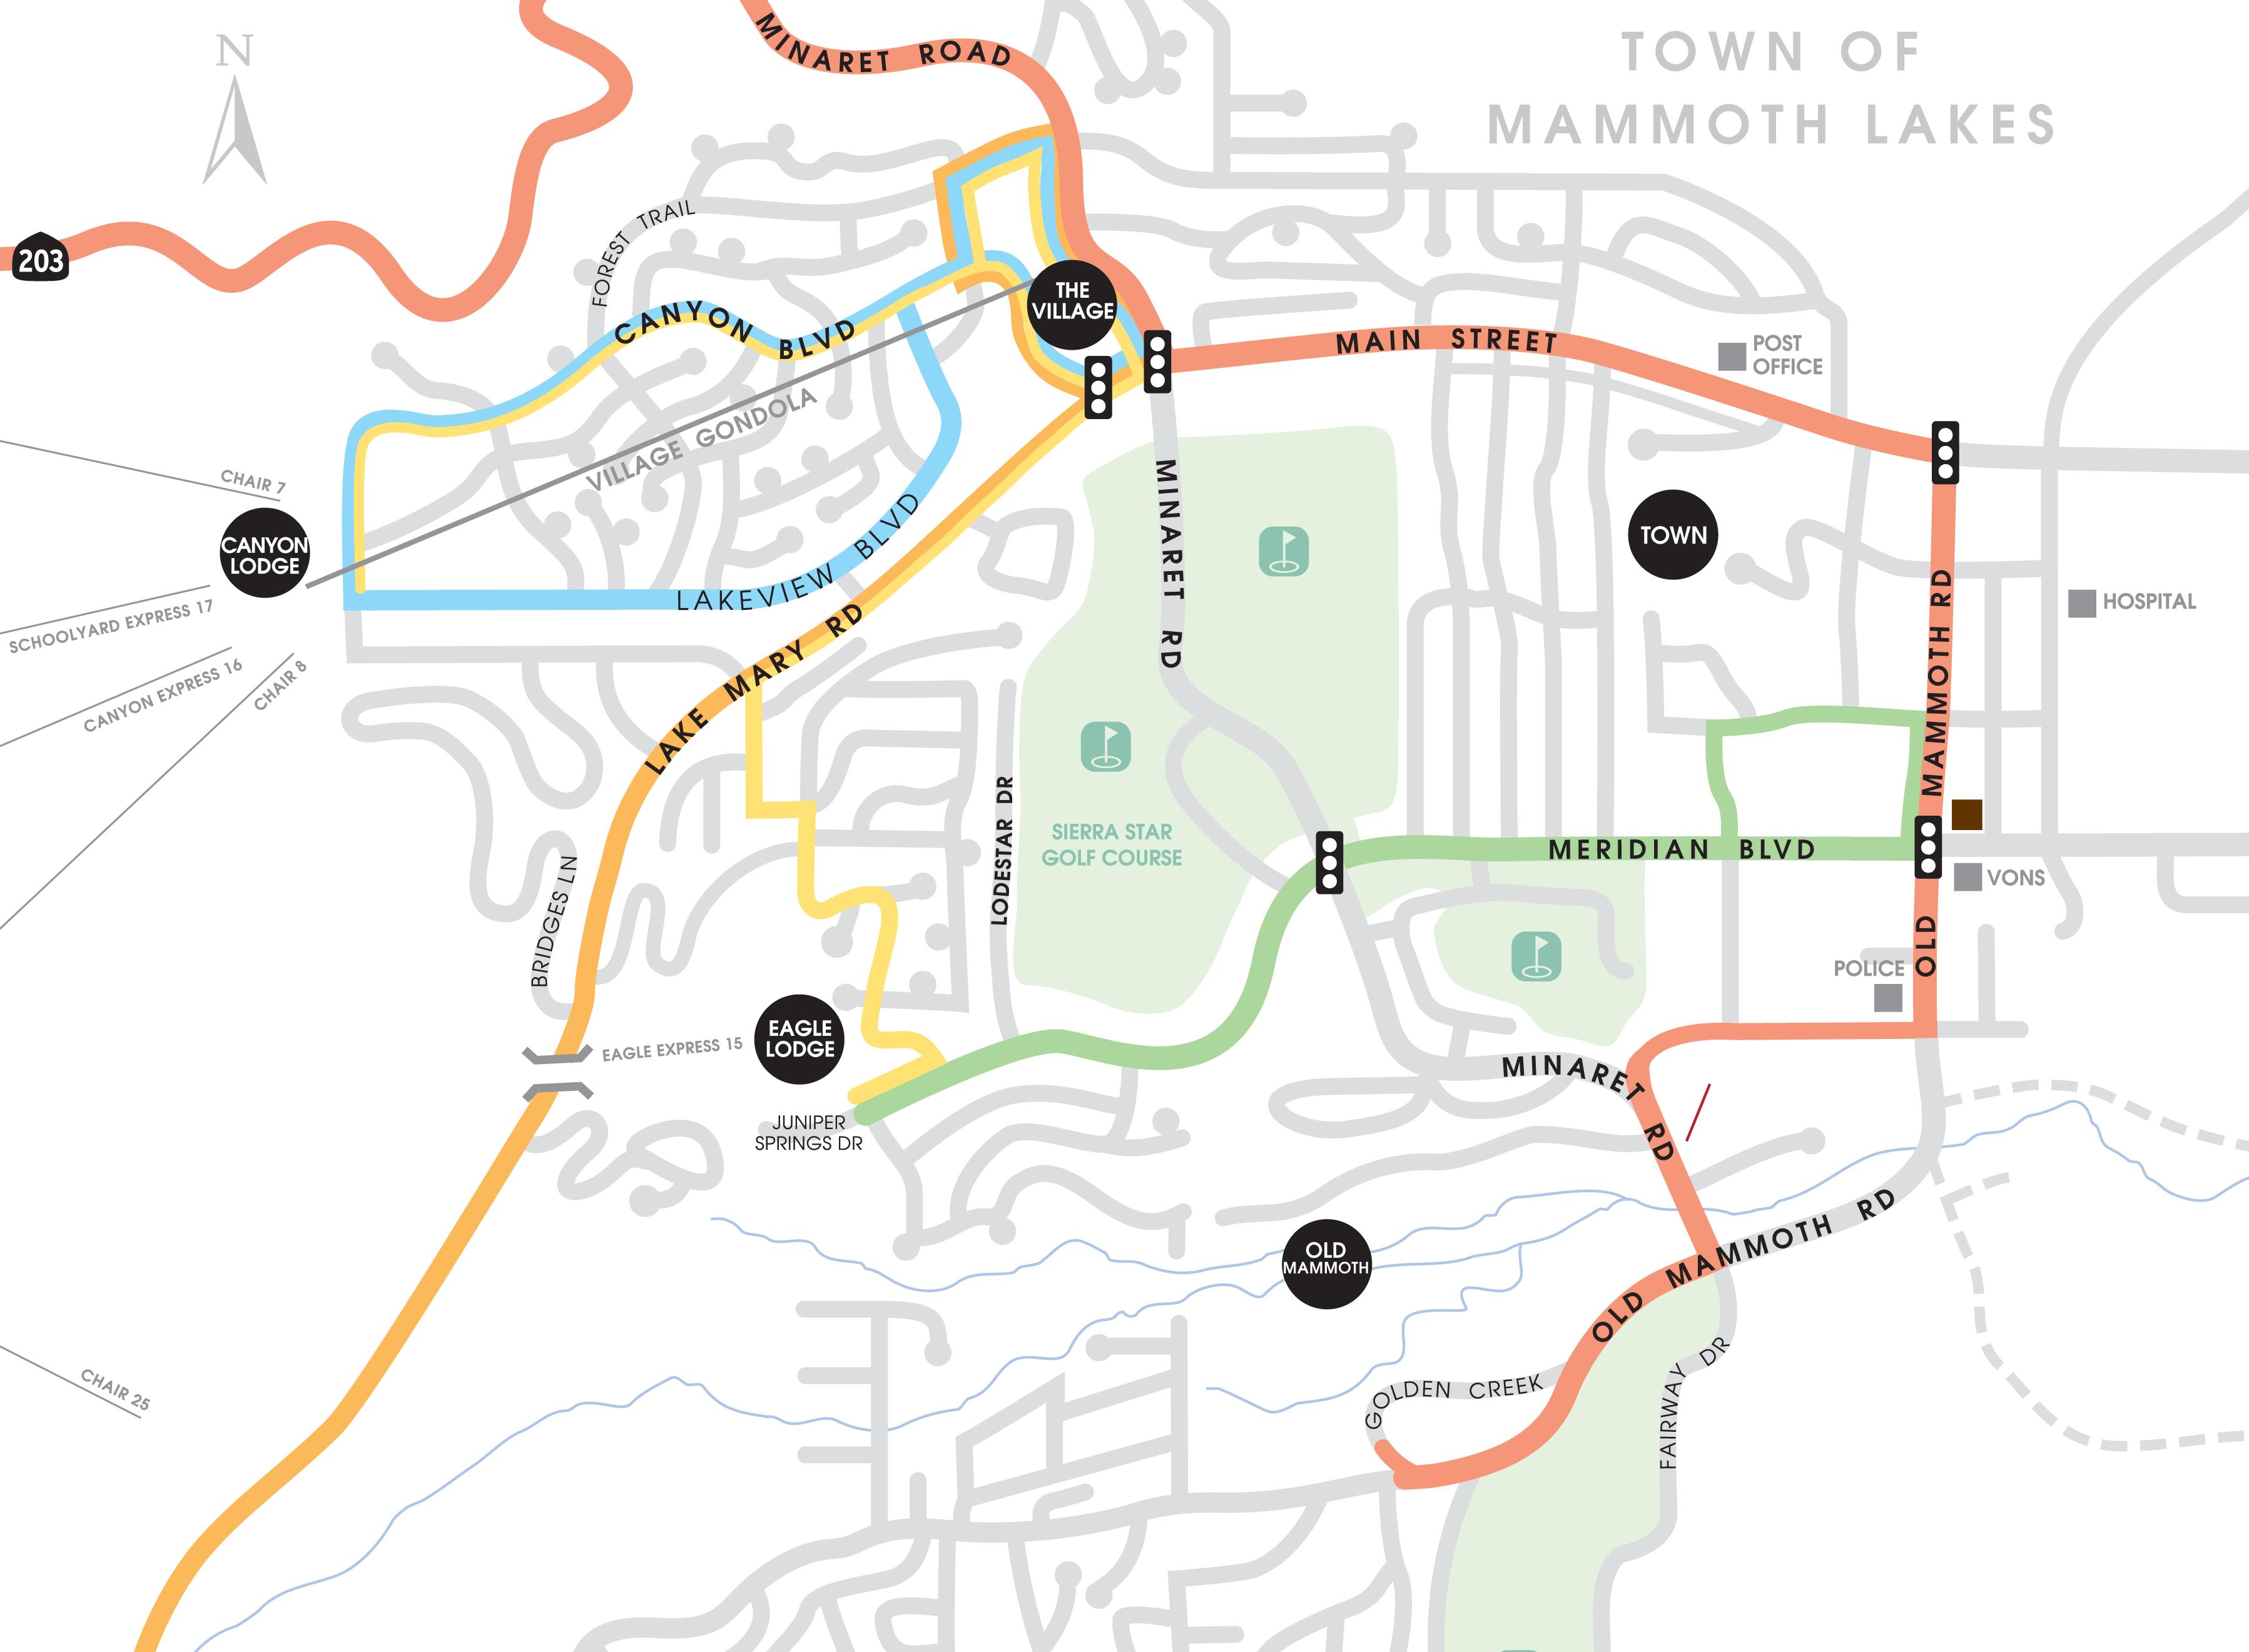 Mammoth Vacation Rentals   Mammoth Mountain Lodging and ... on mammoth ski, mammoth utah, long valley caldera map, ski resort map, lake county california map, trail map, mammoth skatepark, mammoth yellowstone national park, old faithful yellowstone map,